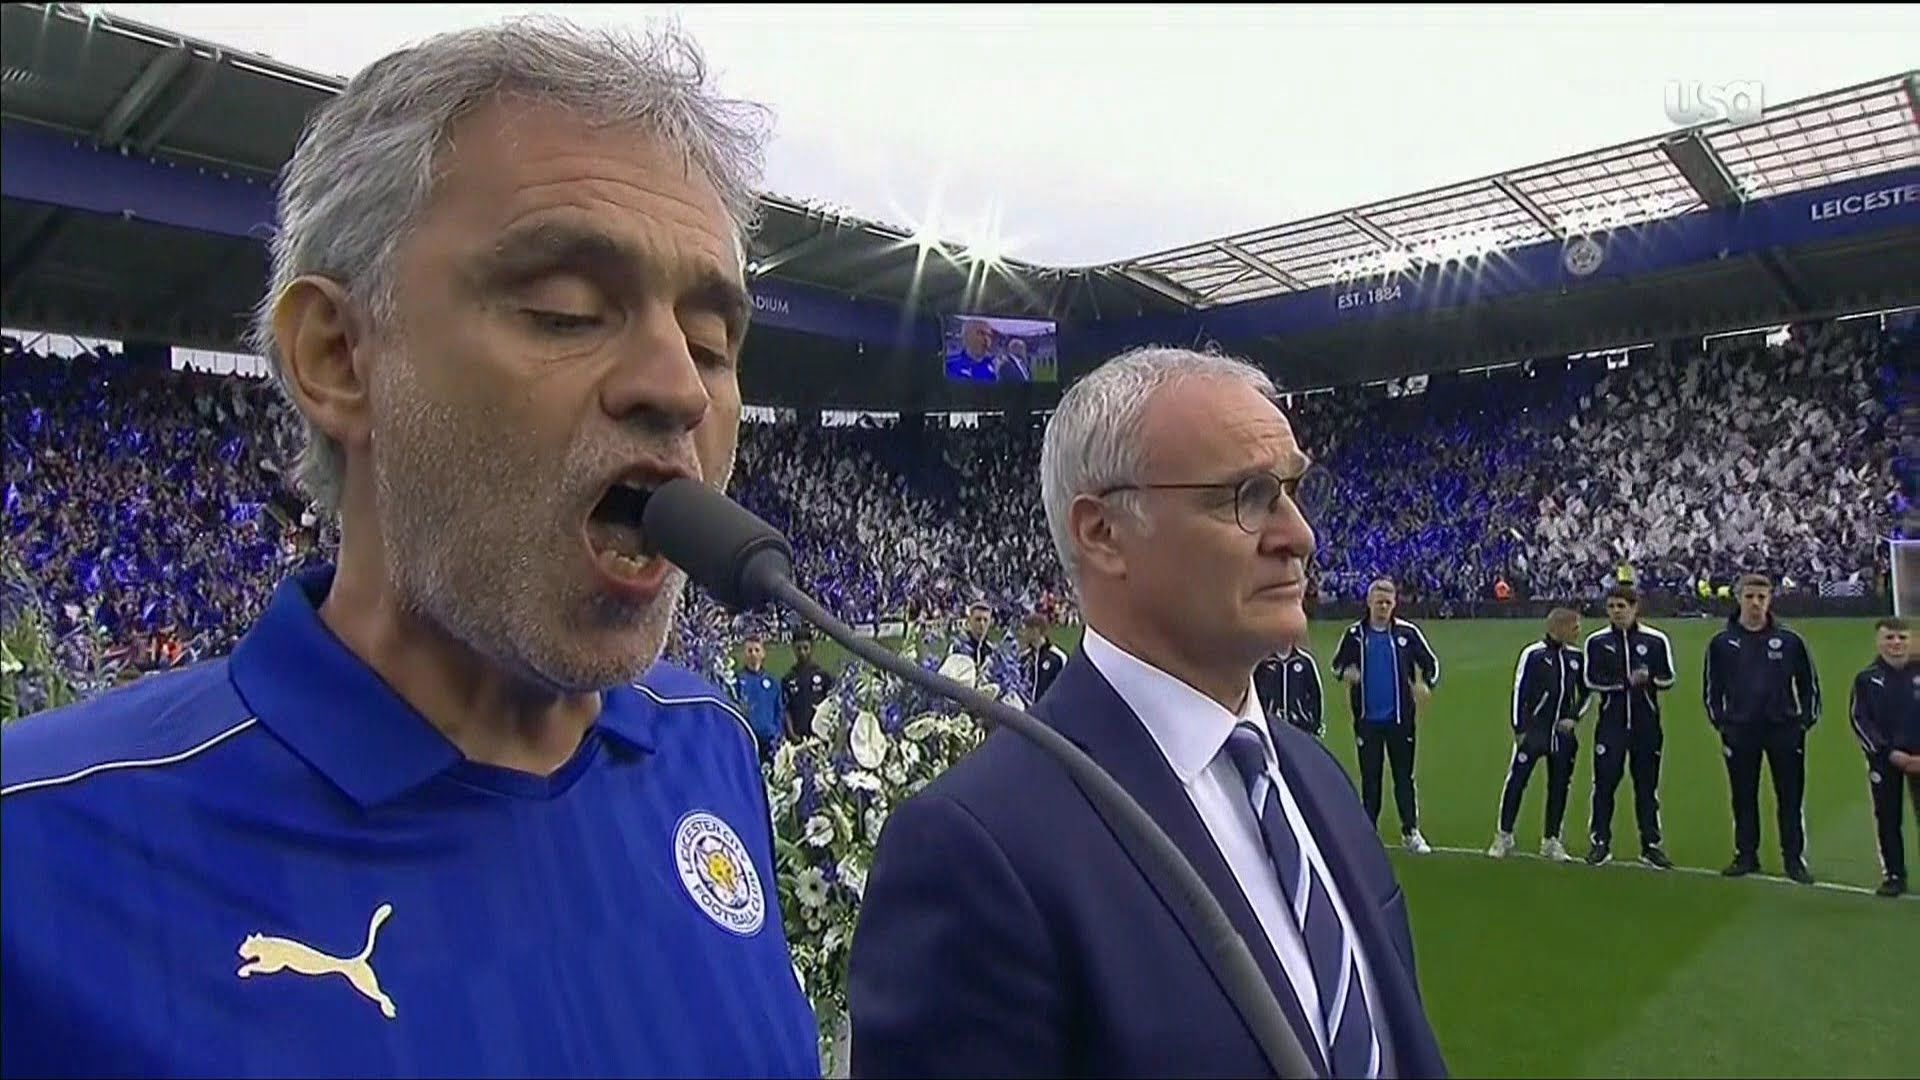 Andrea Bocelli vs. Leicester City Polo ralph lauren